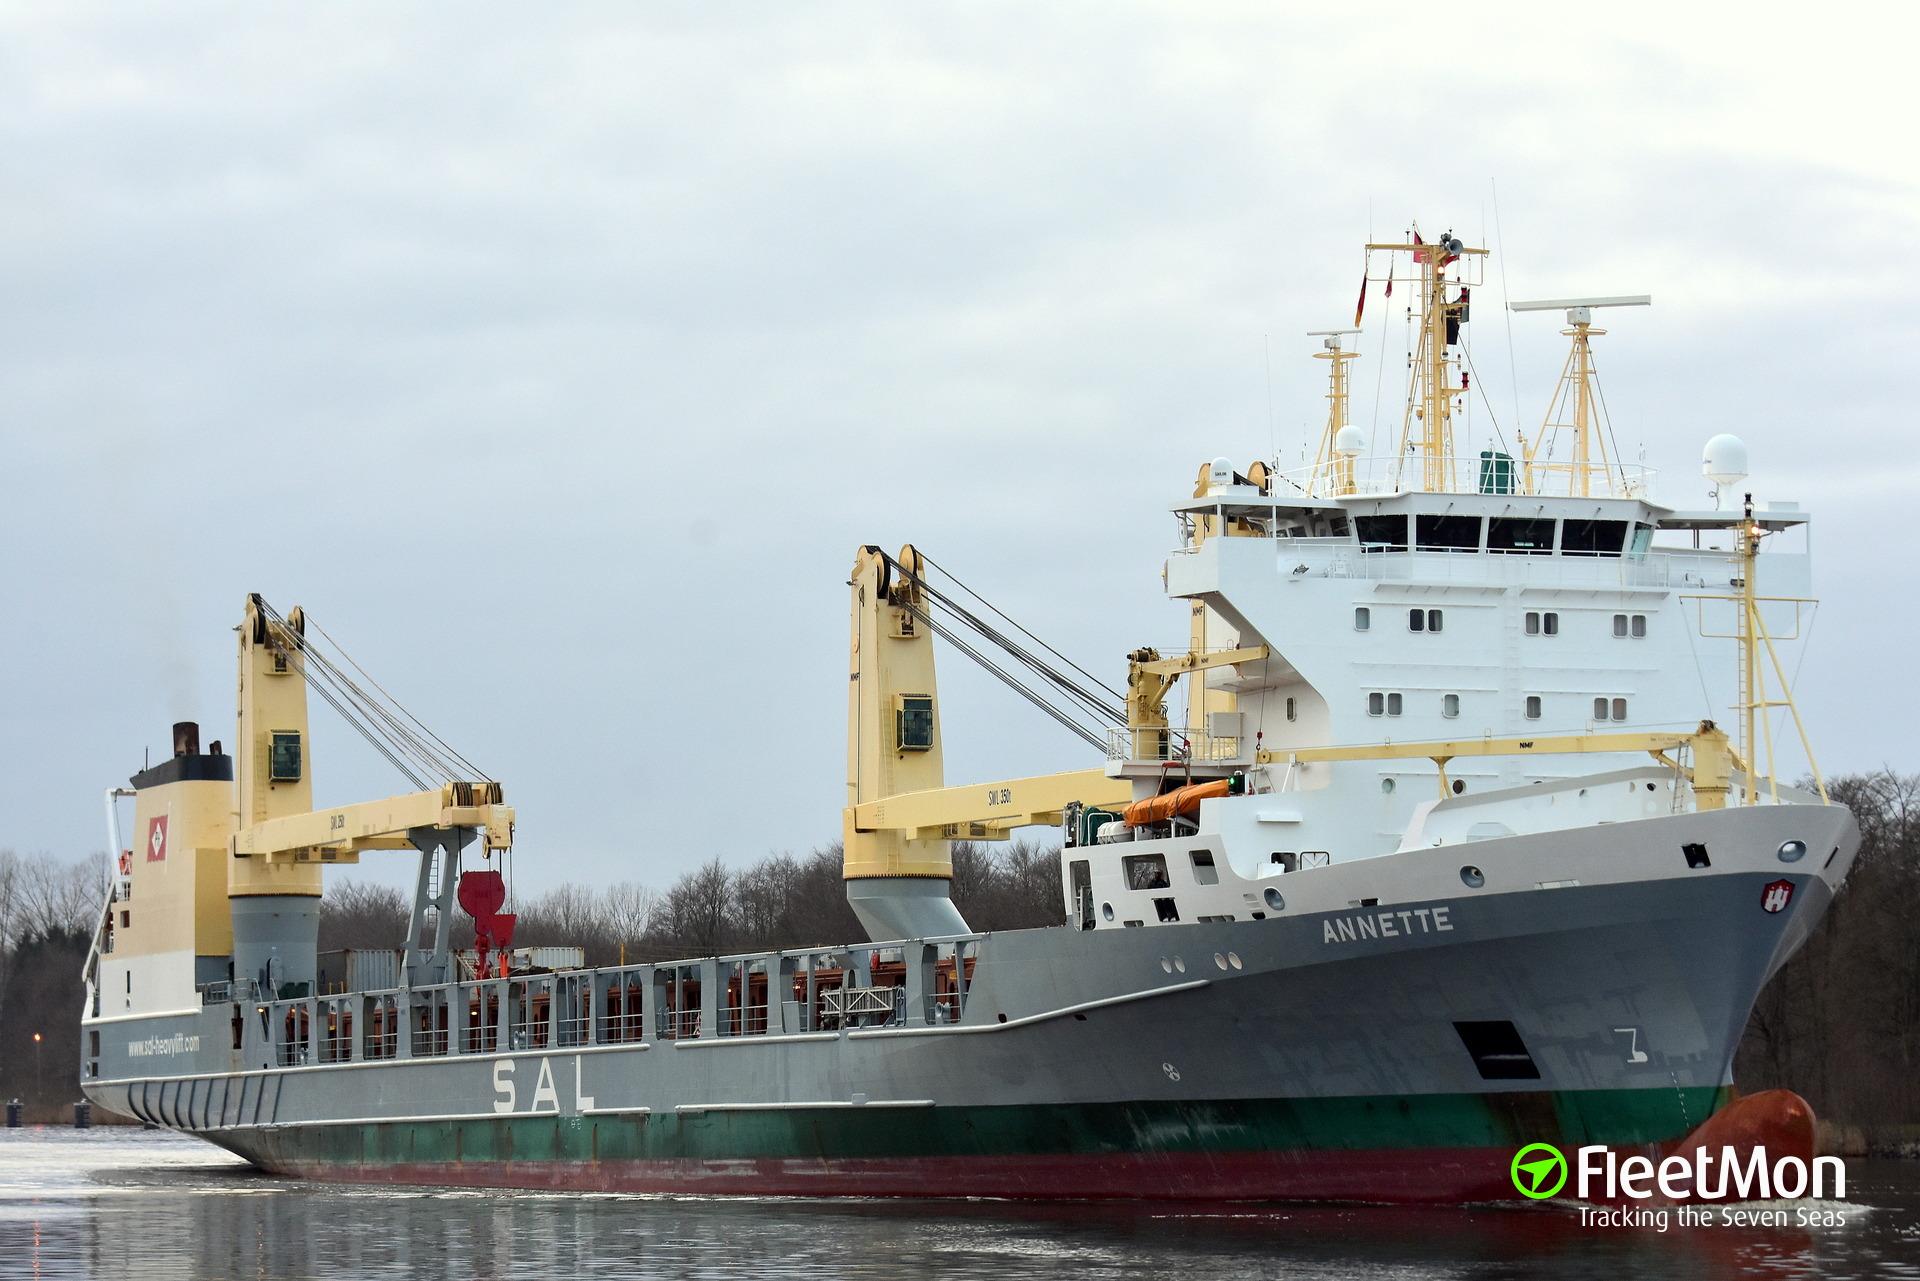 ANNETTE was banned from Kiel Canal transit